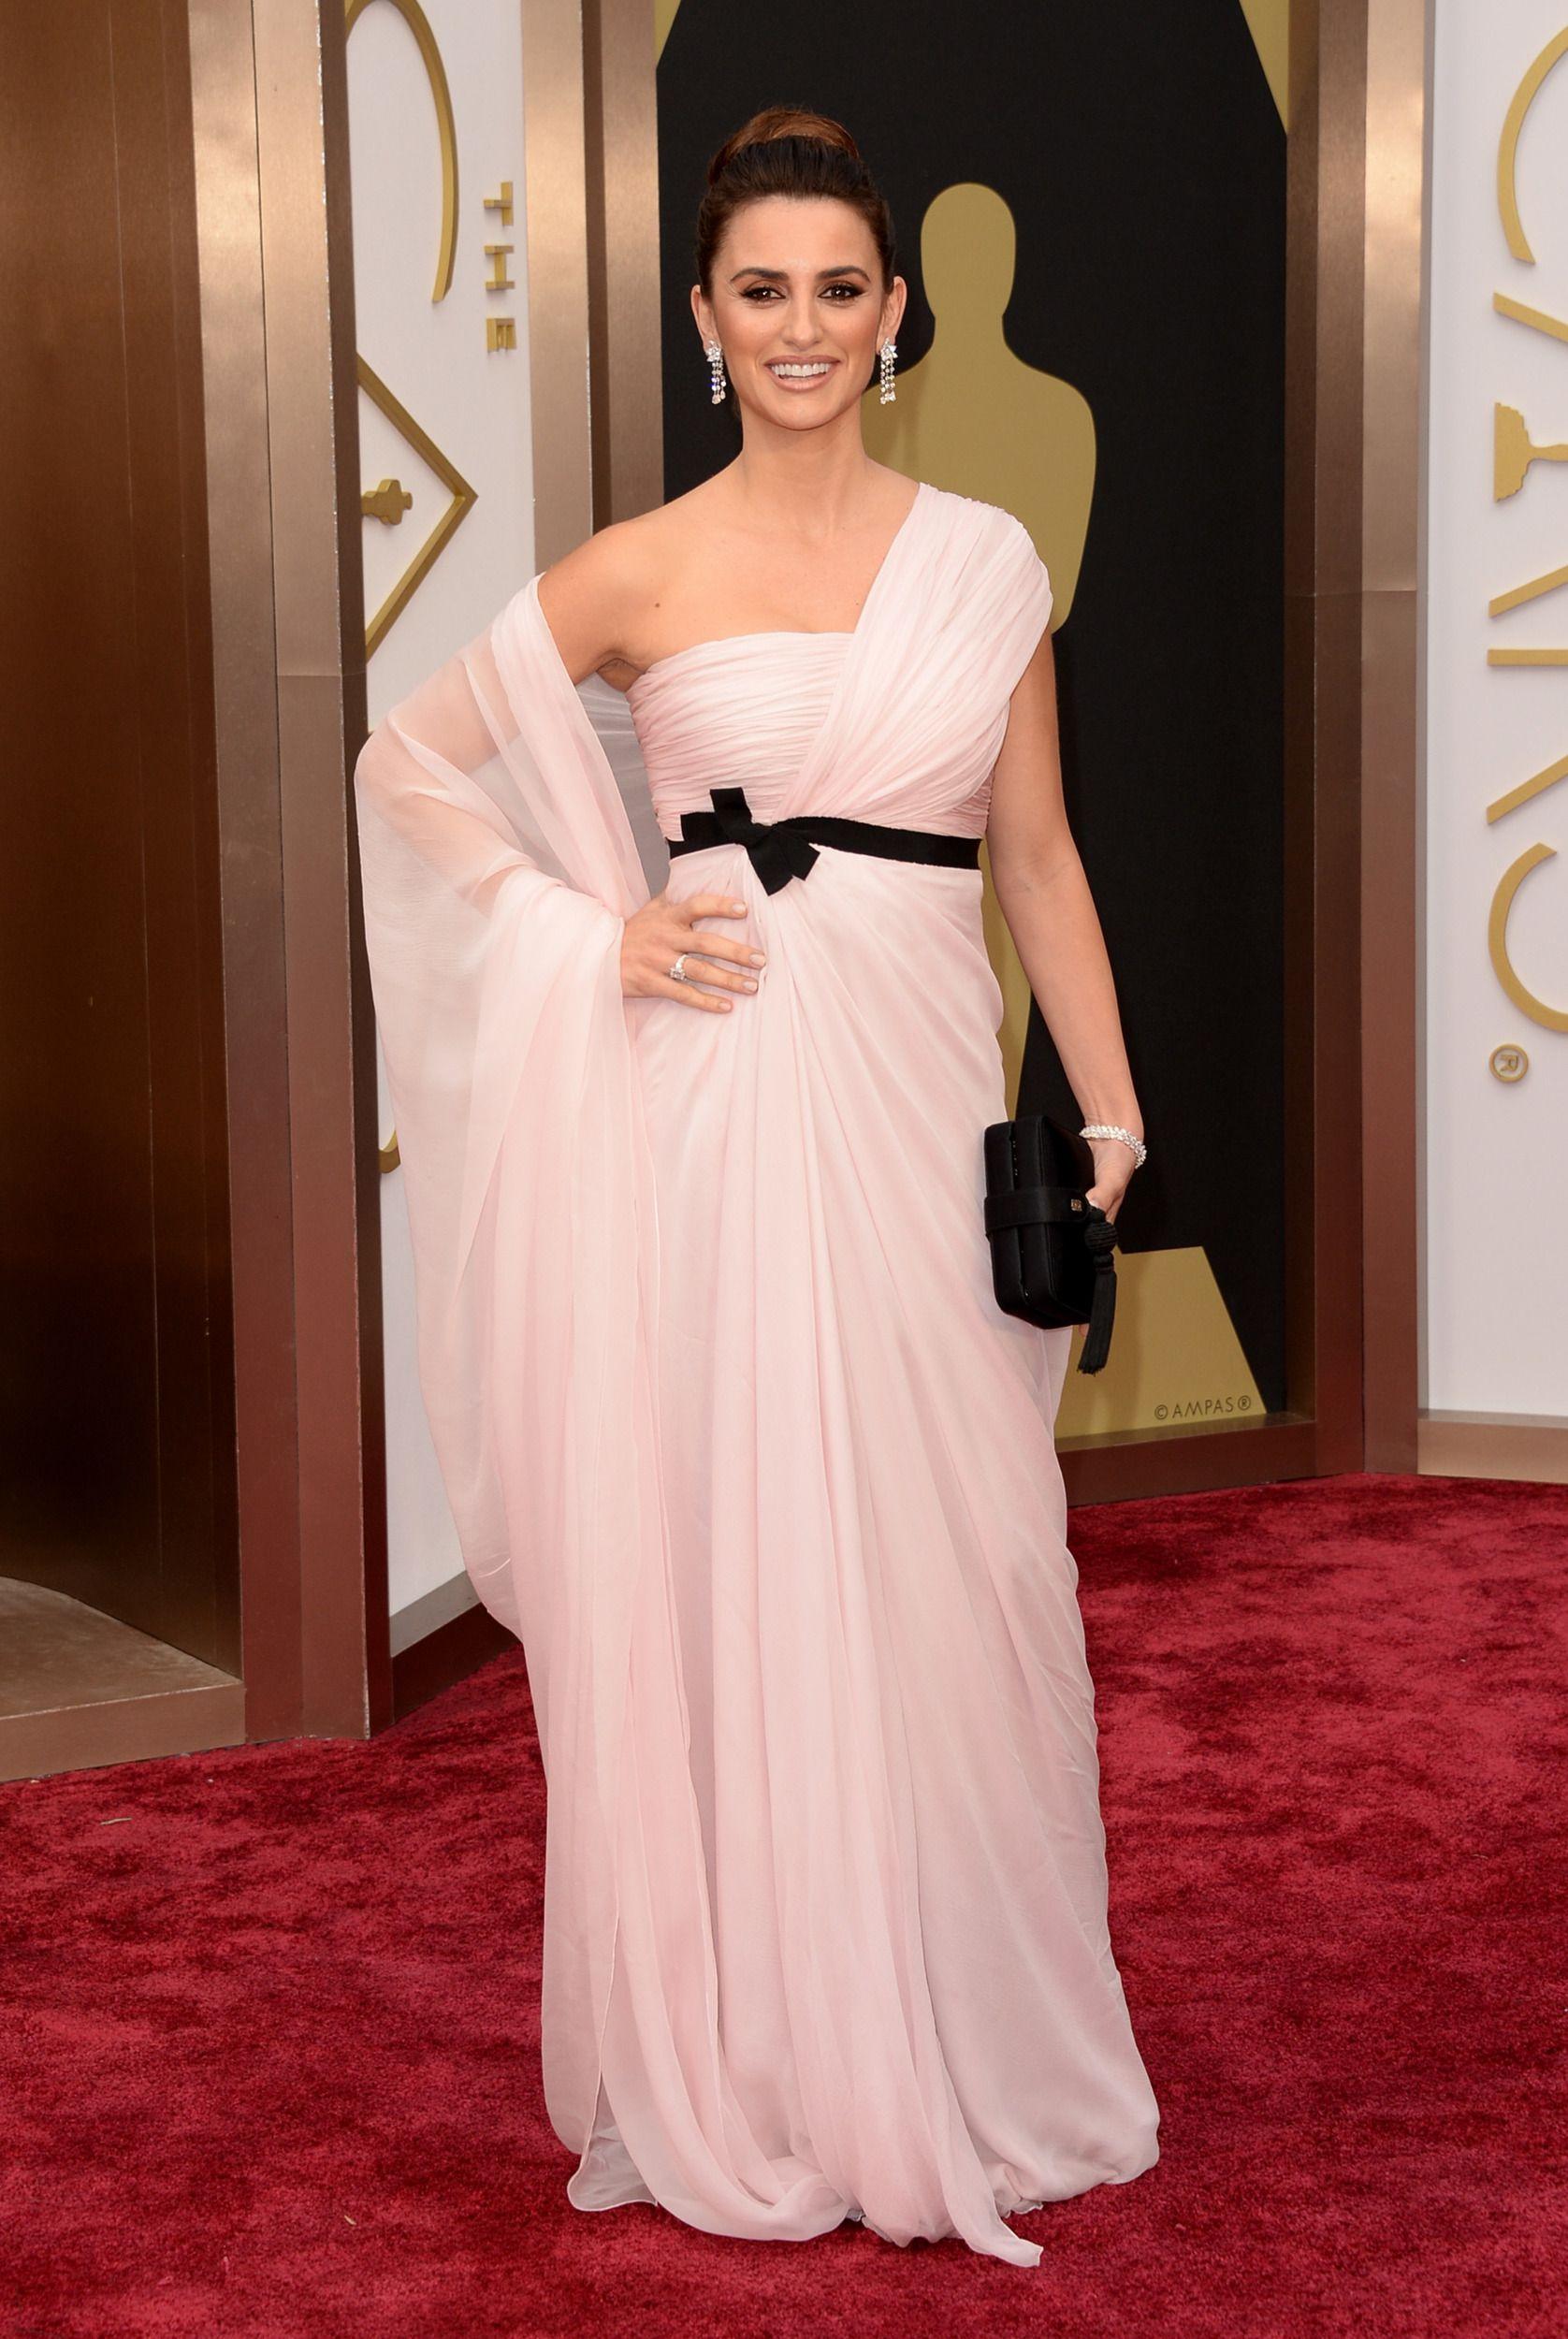 PenelopeCruz #Oscars2014 #OTRC | Gorgeous Dresses/Gowns | Pinterest